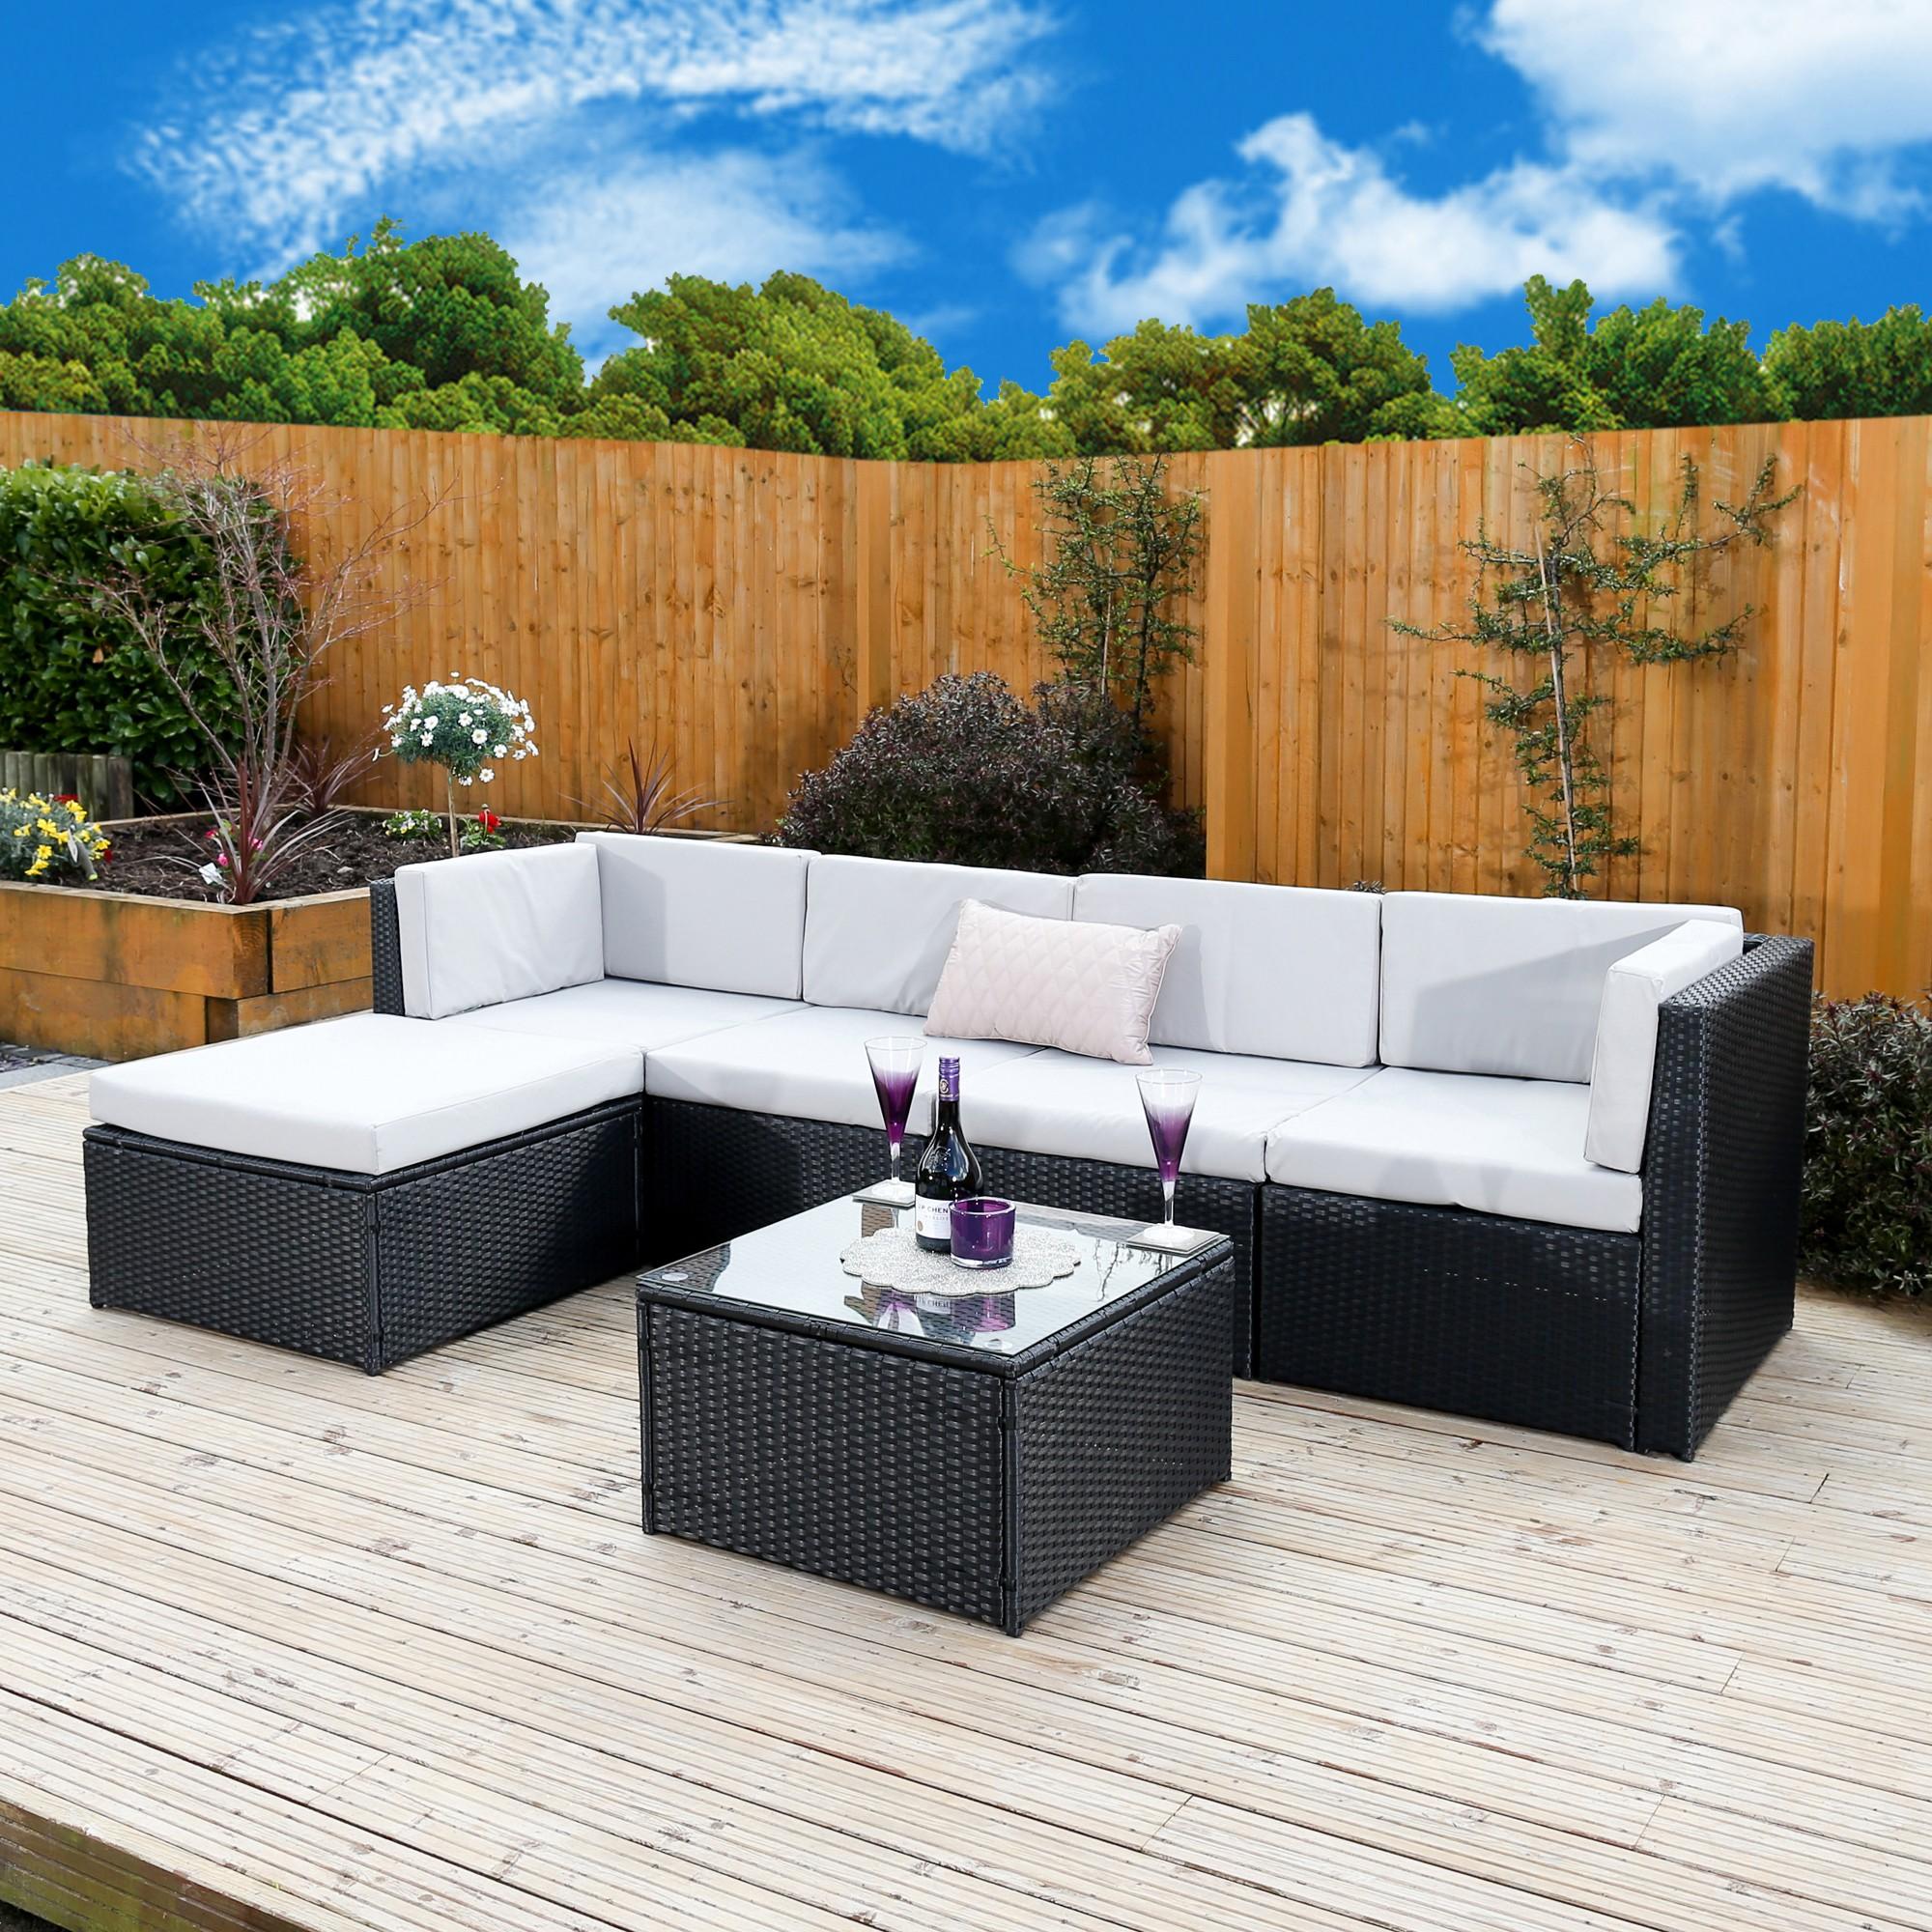 wicker garden furniture modular wicker outdoor furniture outdoor designs from contemporary outdoor  sofa furniture, GTXNWSL